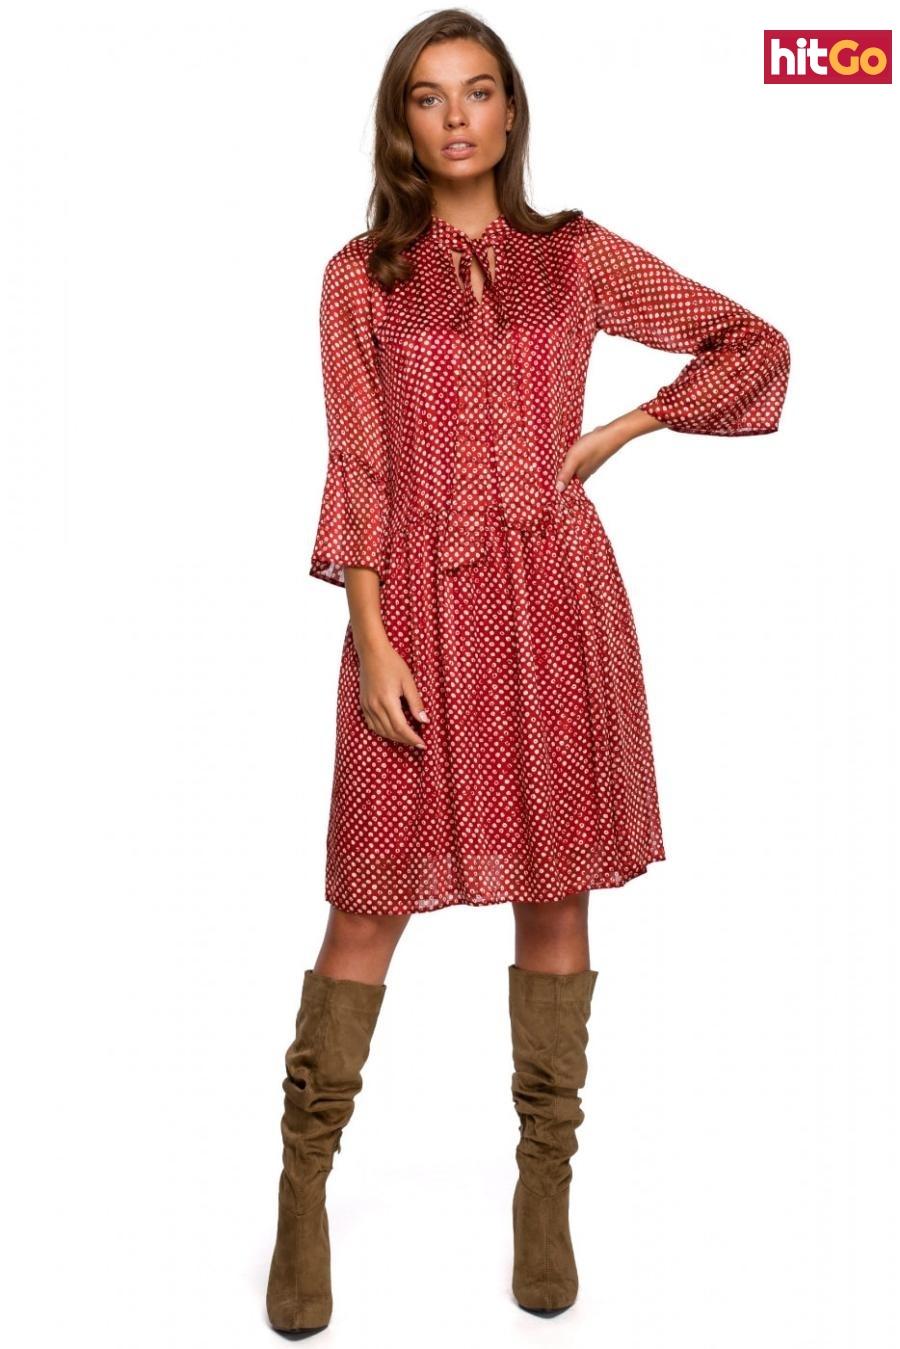 Stylove Womans Dress S237 Model 2 dámské wzorzysty XL